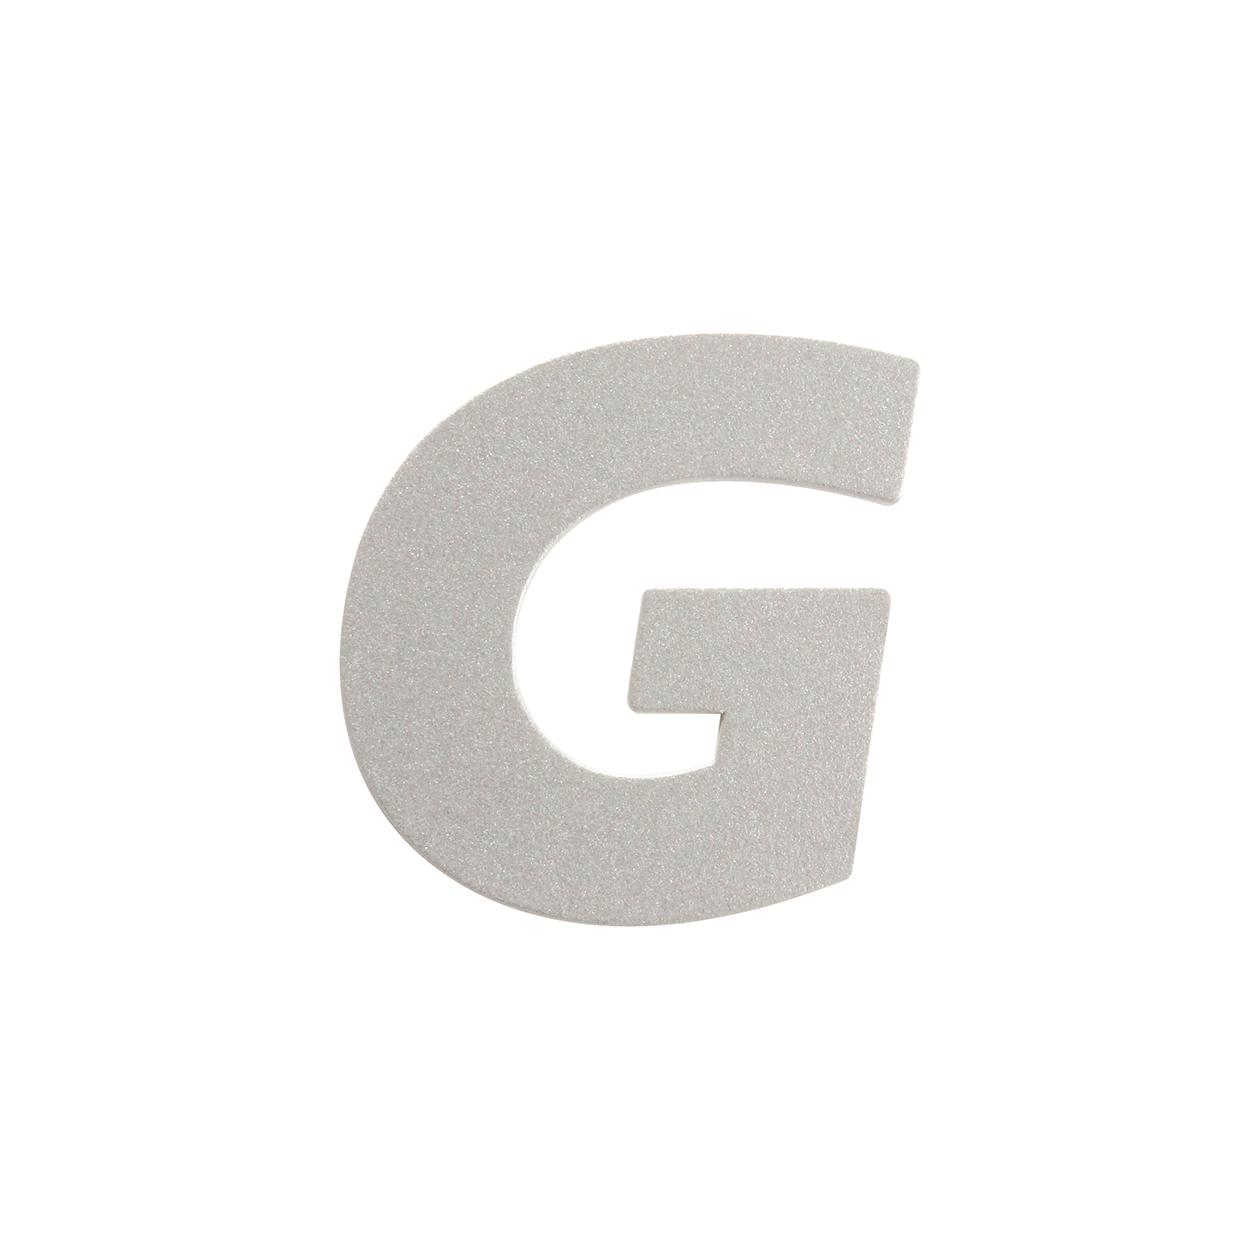 No.395ボード A7カードDC 文字G シルバー